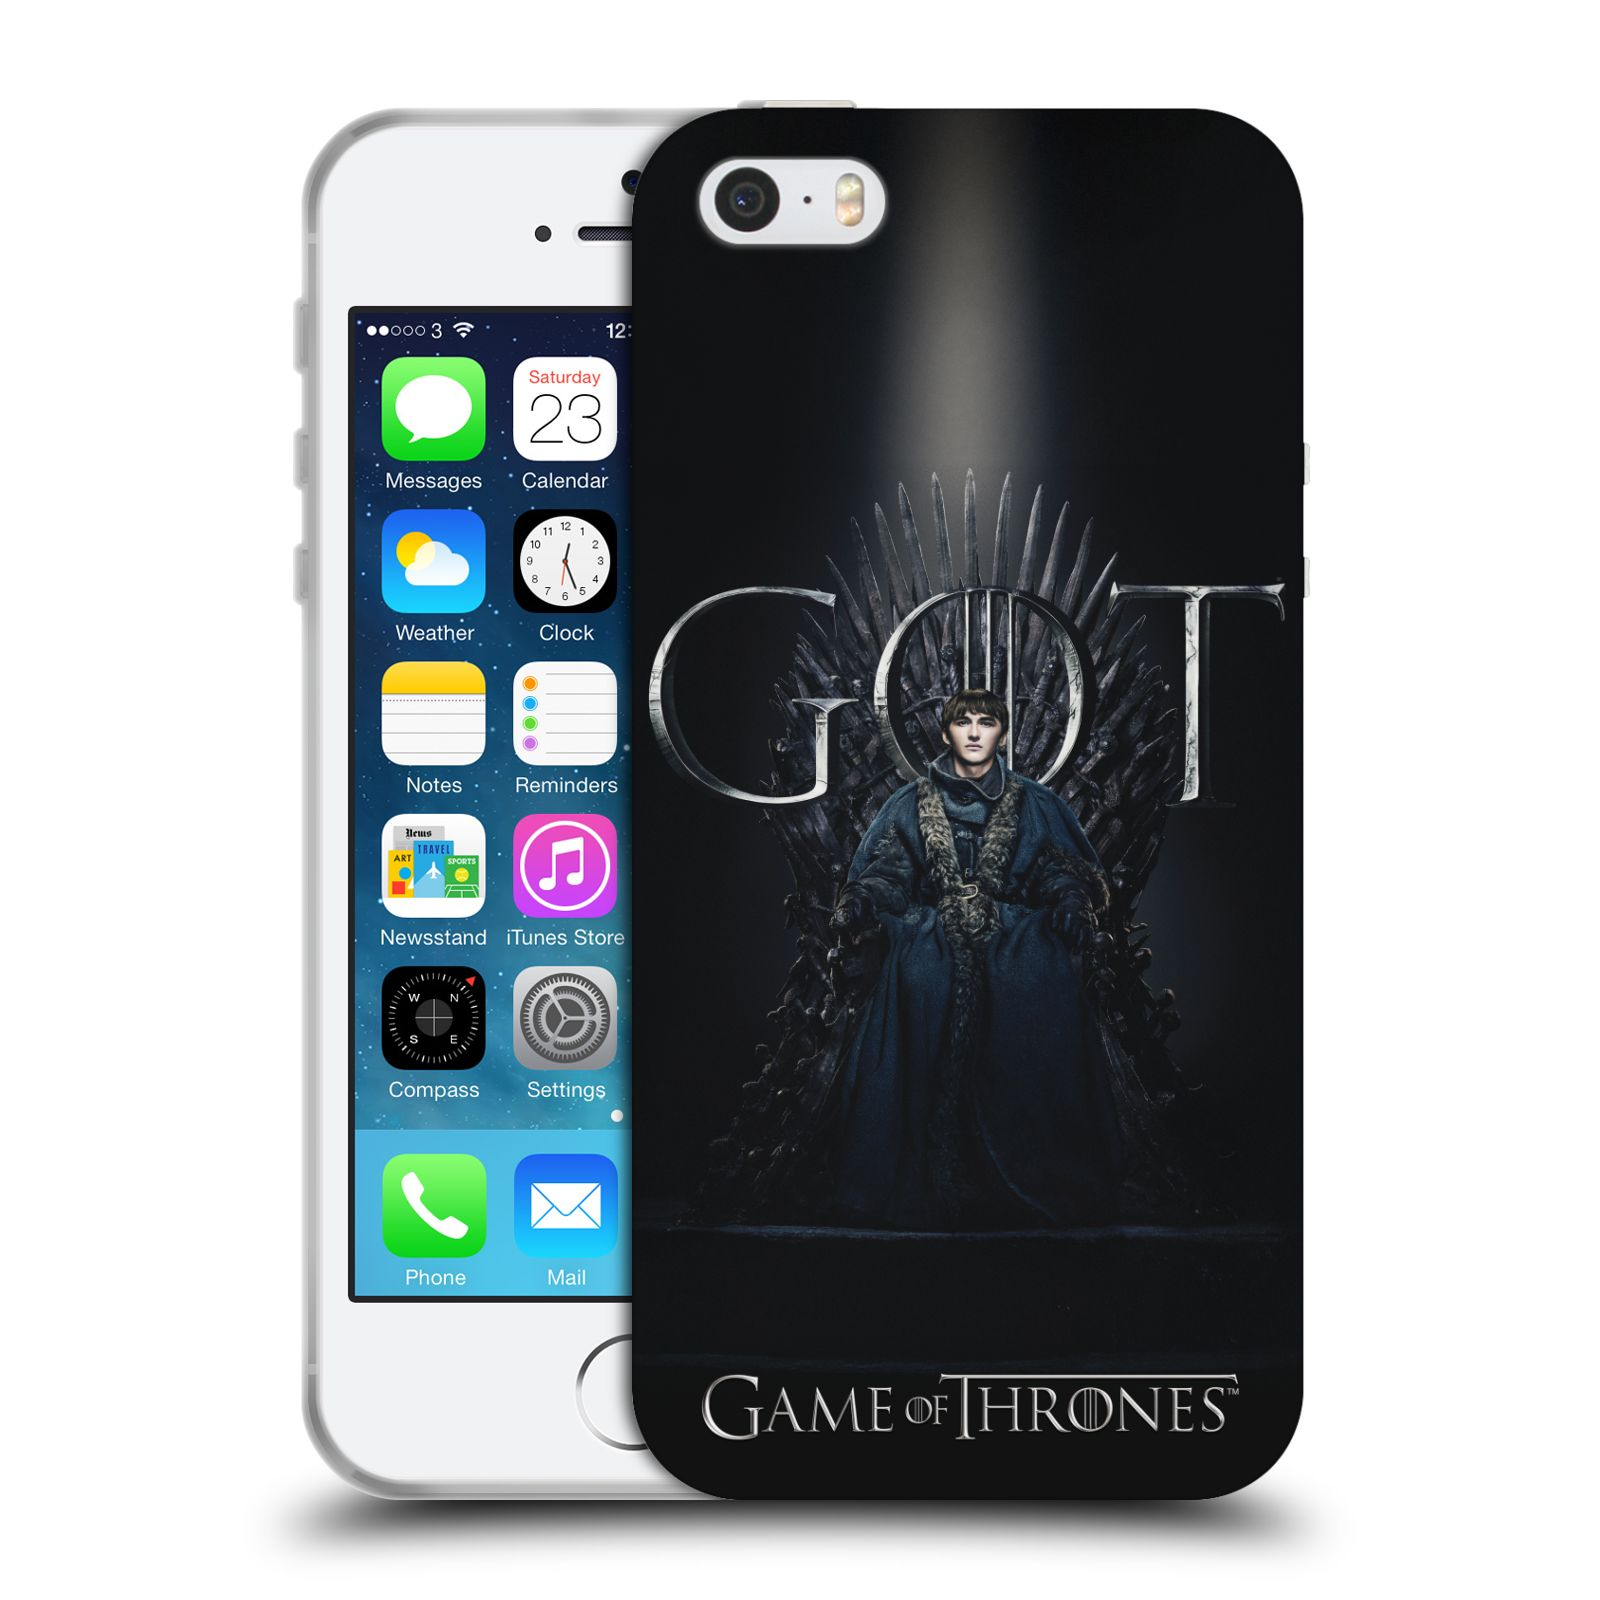 Silikonové pouzdro na mobil Apple iPhone 5, 5S, SE - Head Case - Hra o trůny - Bran Stark